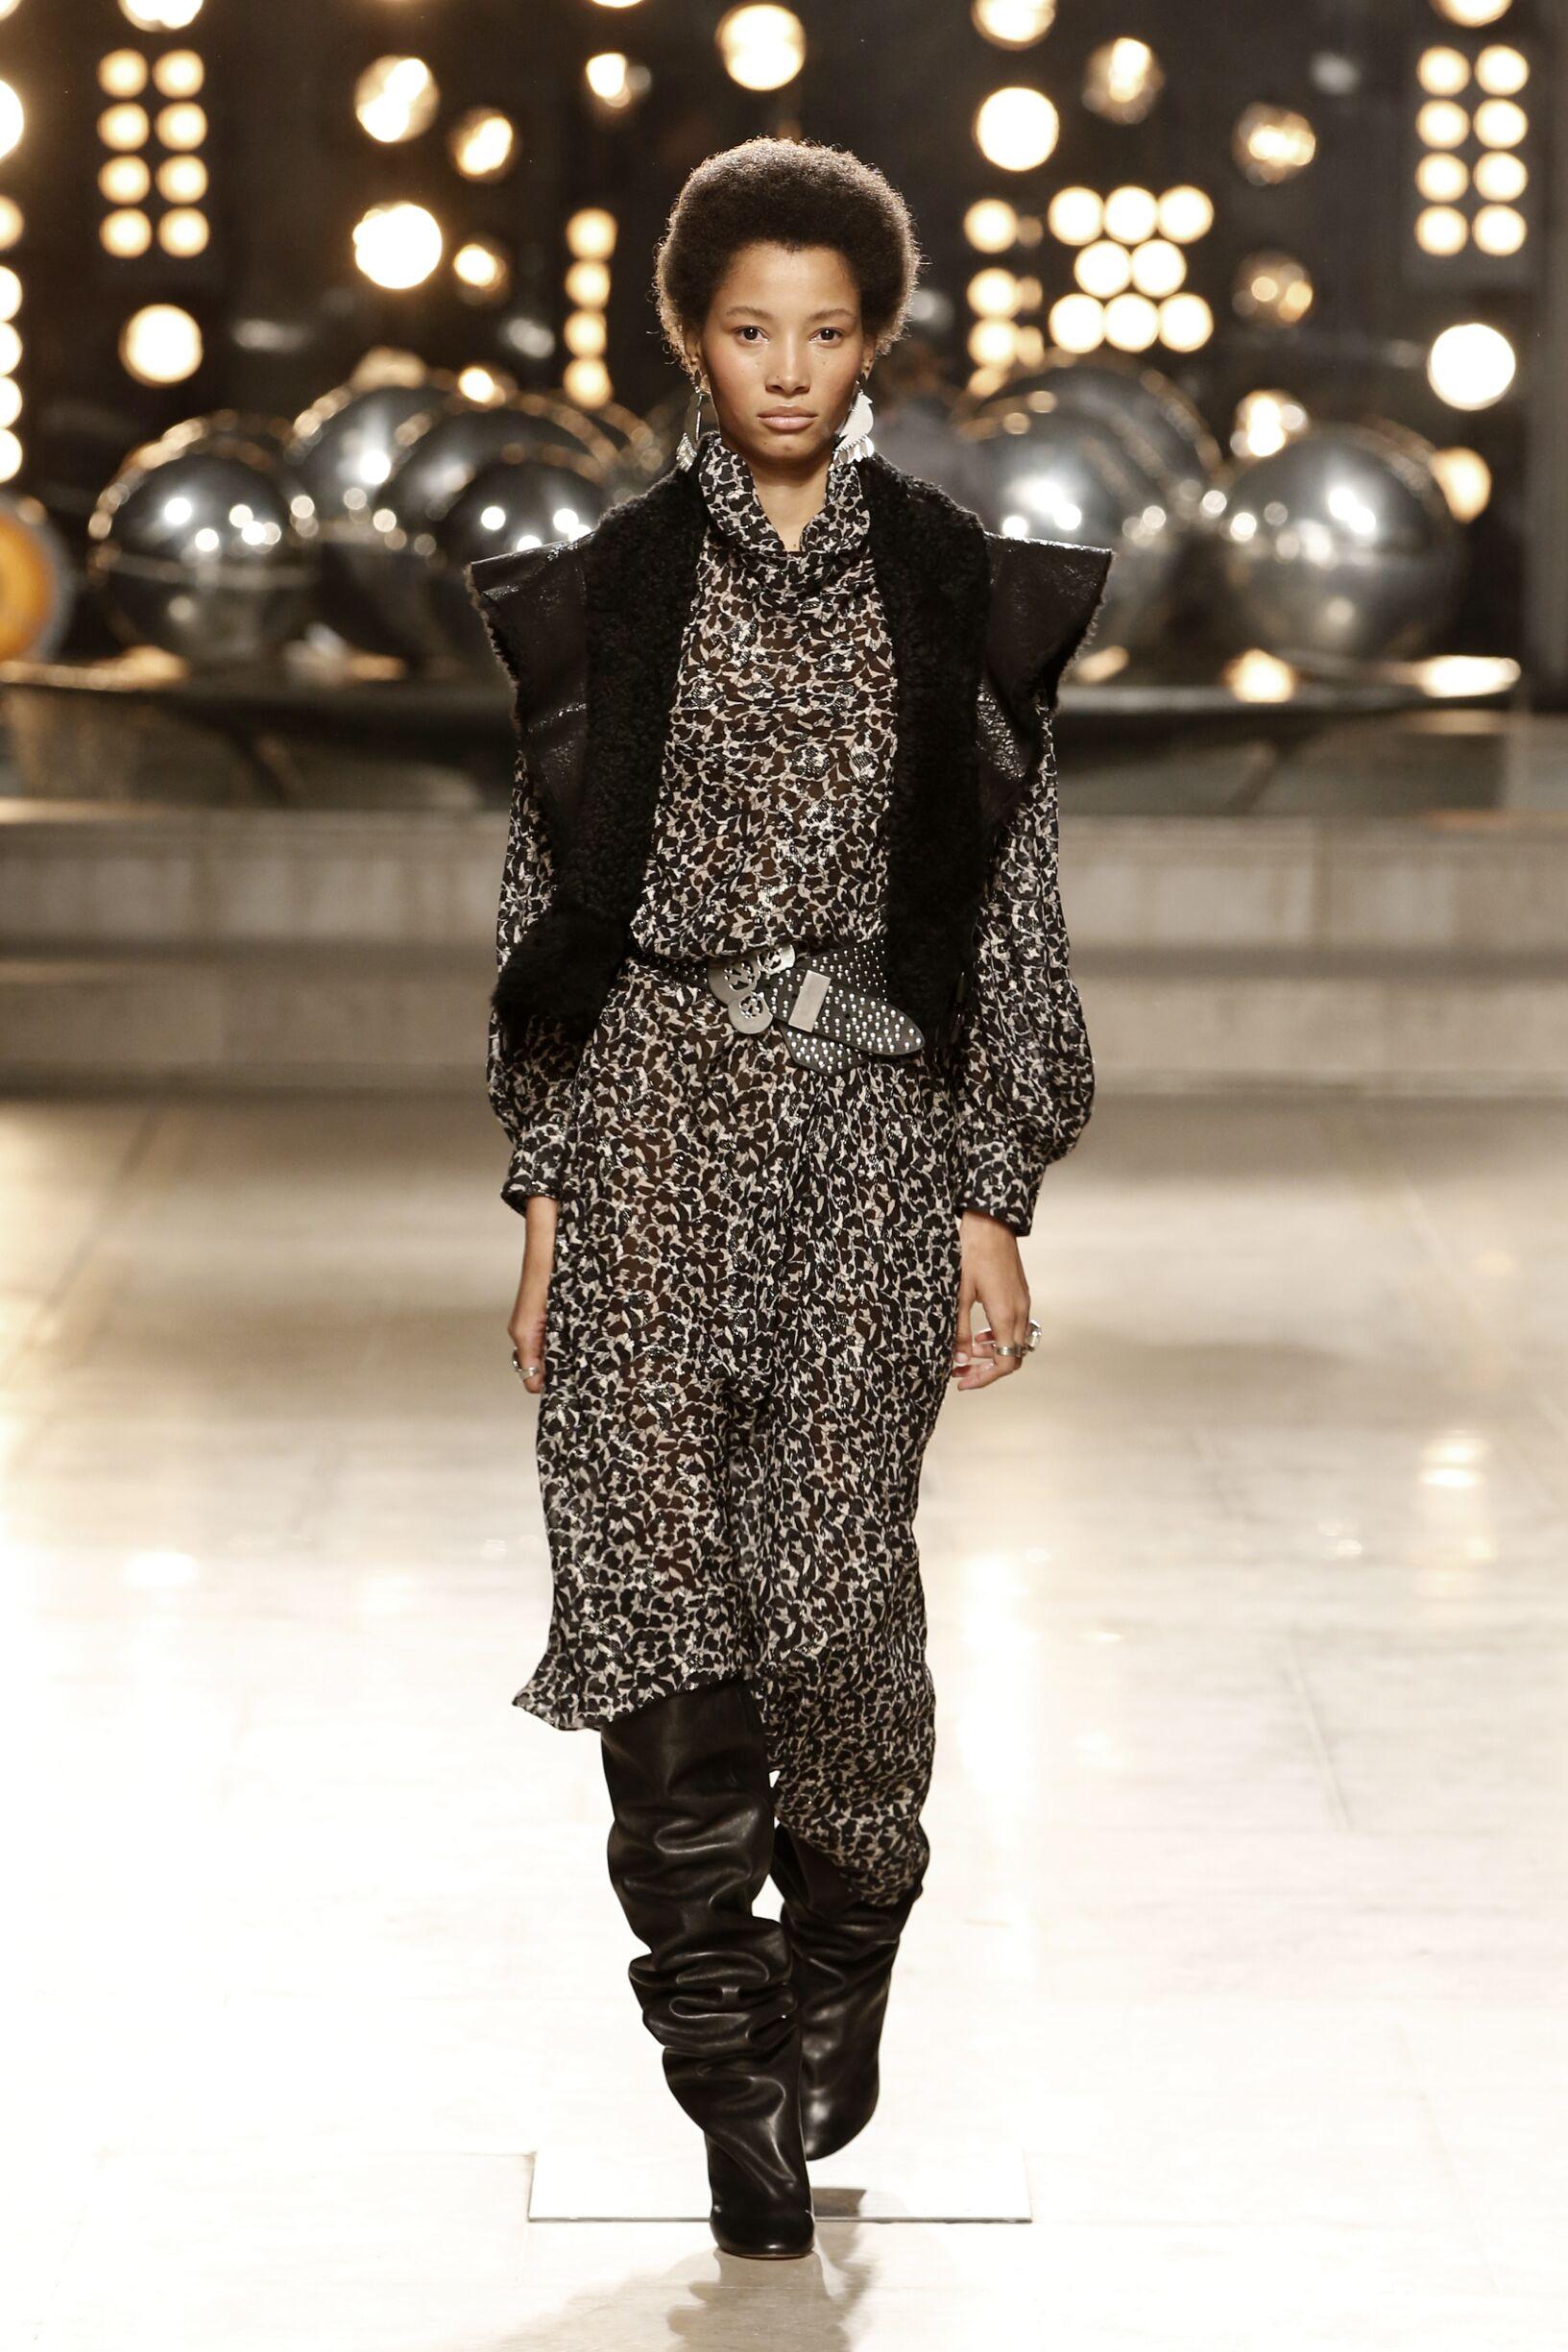 Isabel Marant Paris Fashion Week Womenswear 2019-20